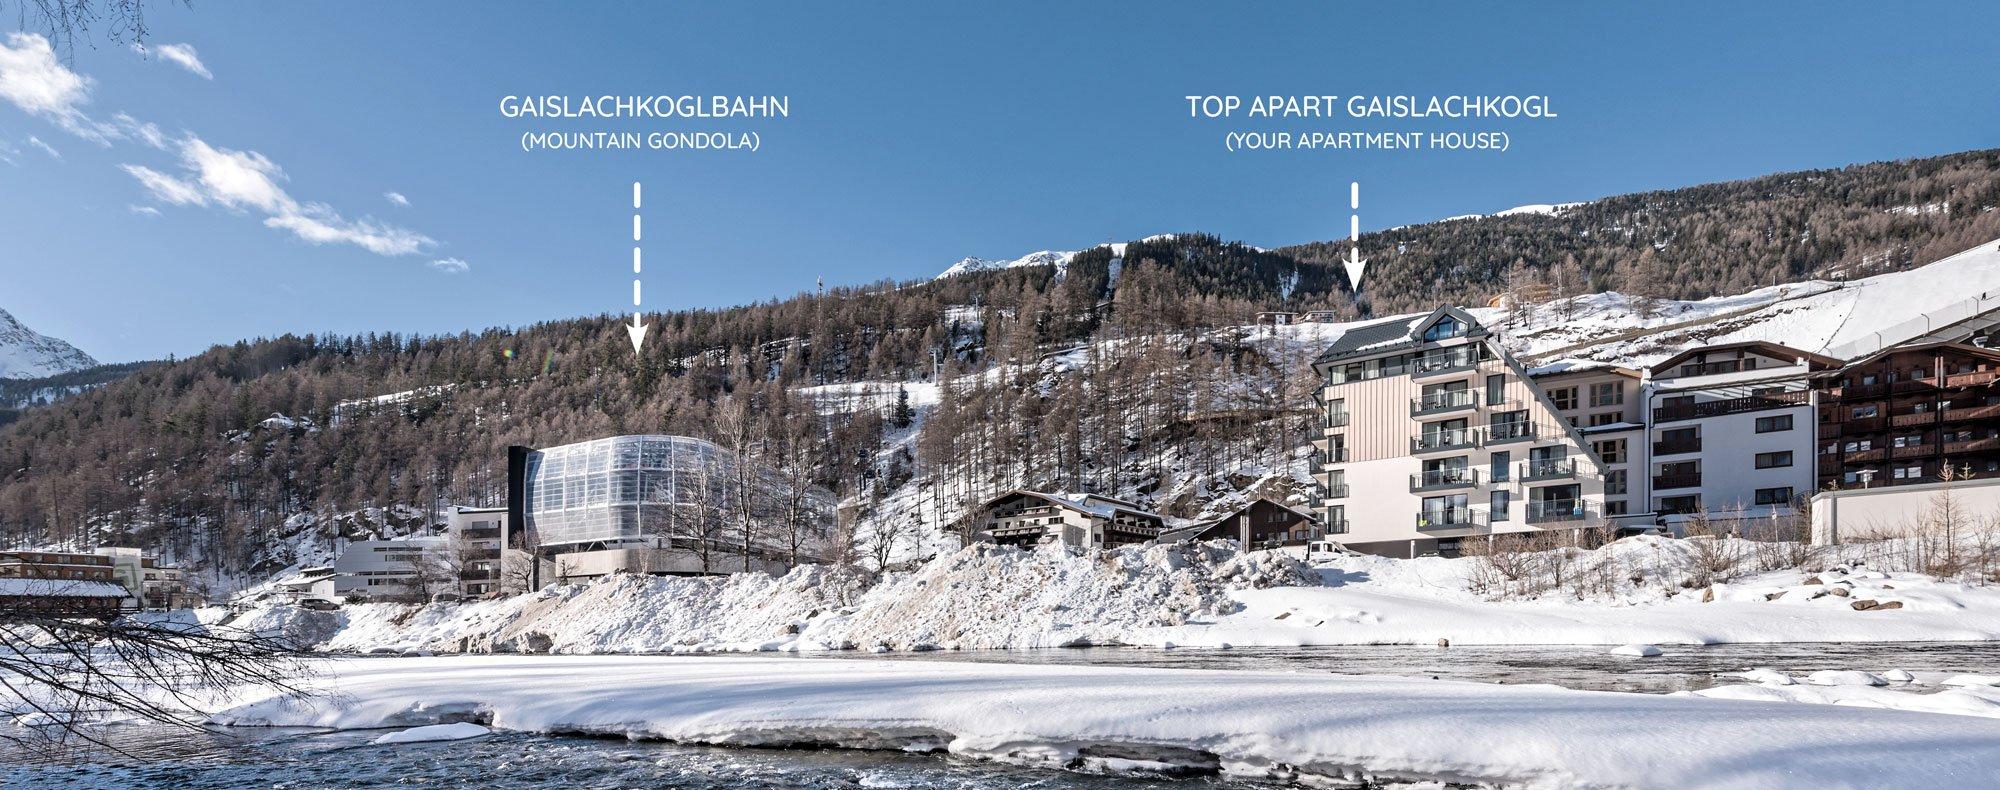 Top Apart Gaislachkogl Sölden